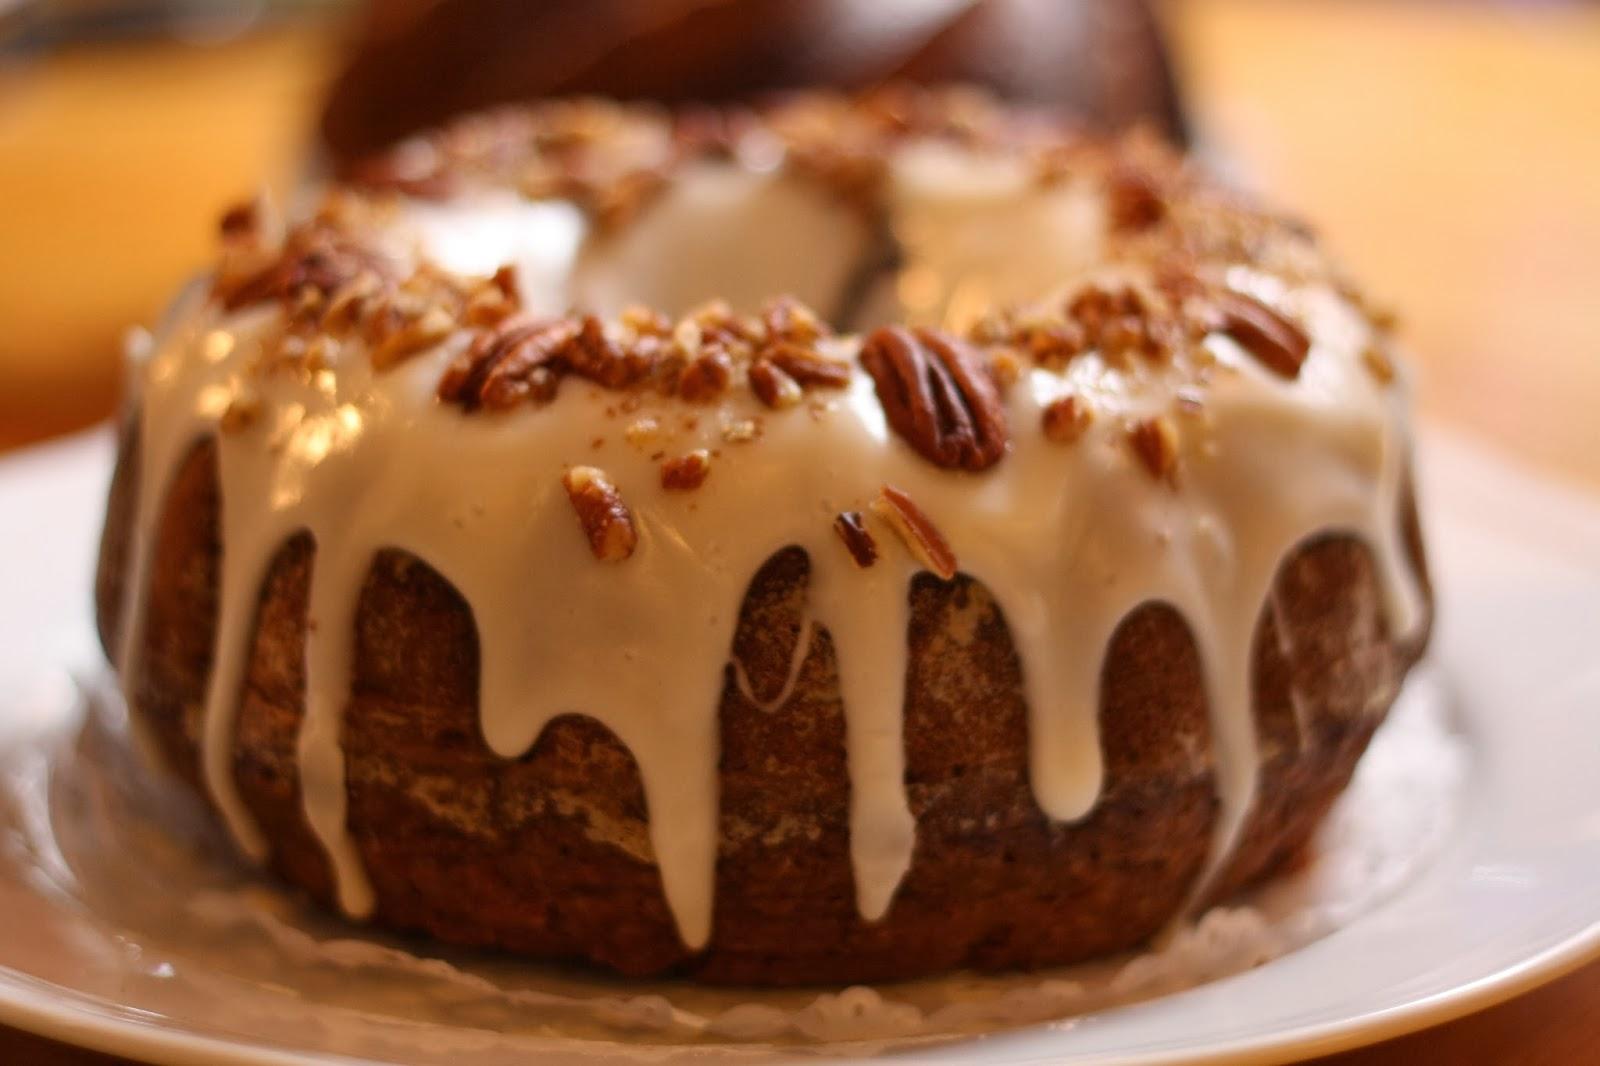 Sams Club Italian Cream Cake